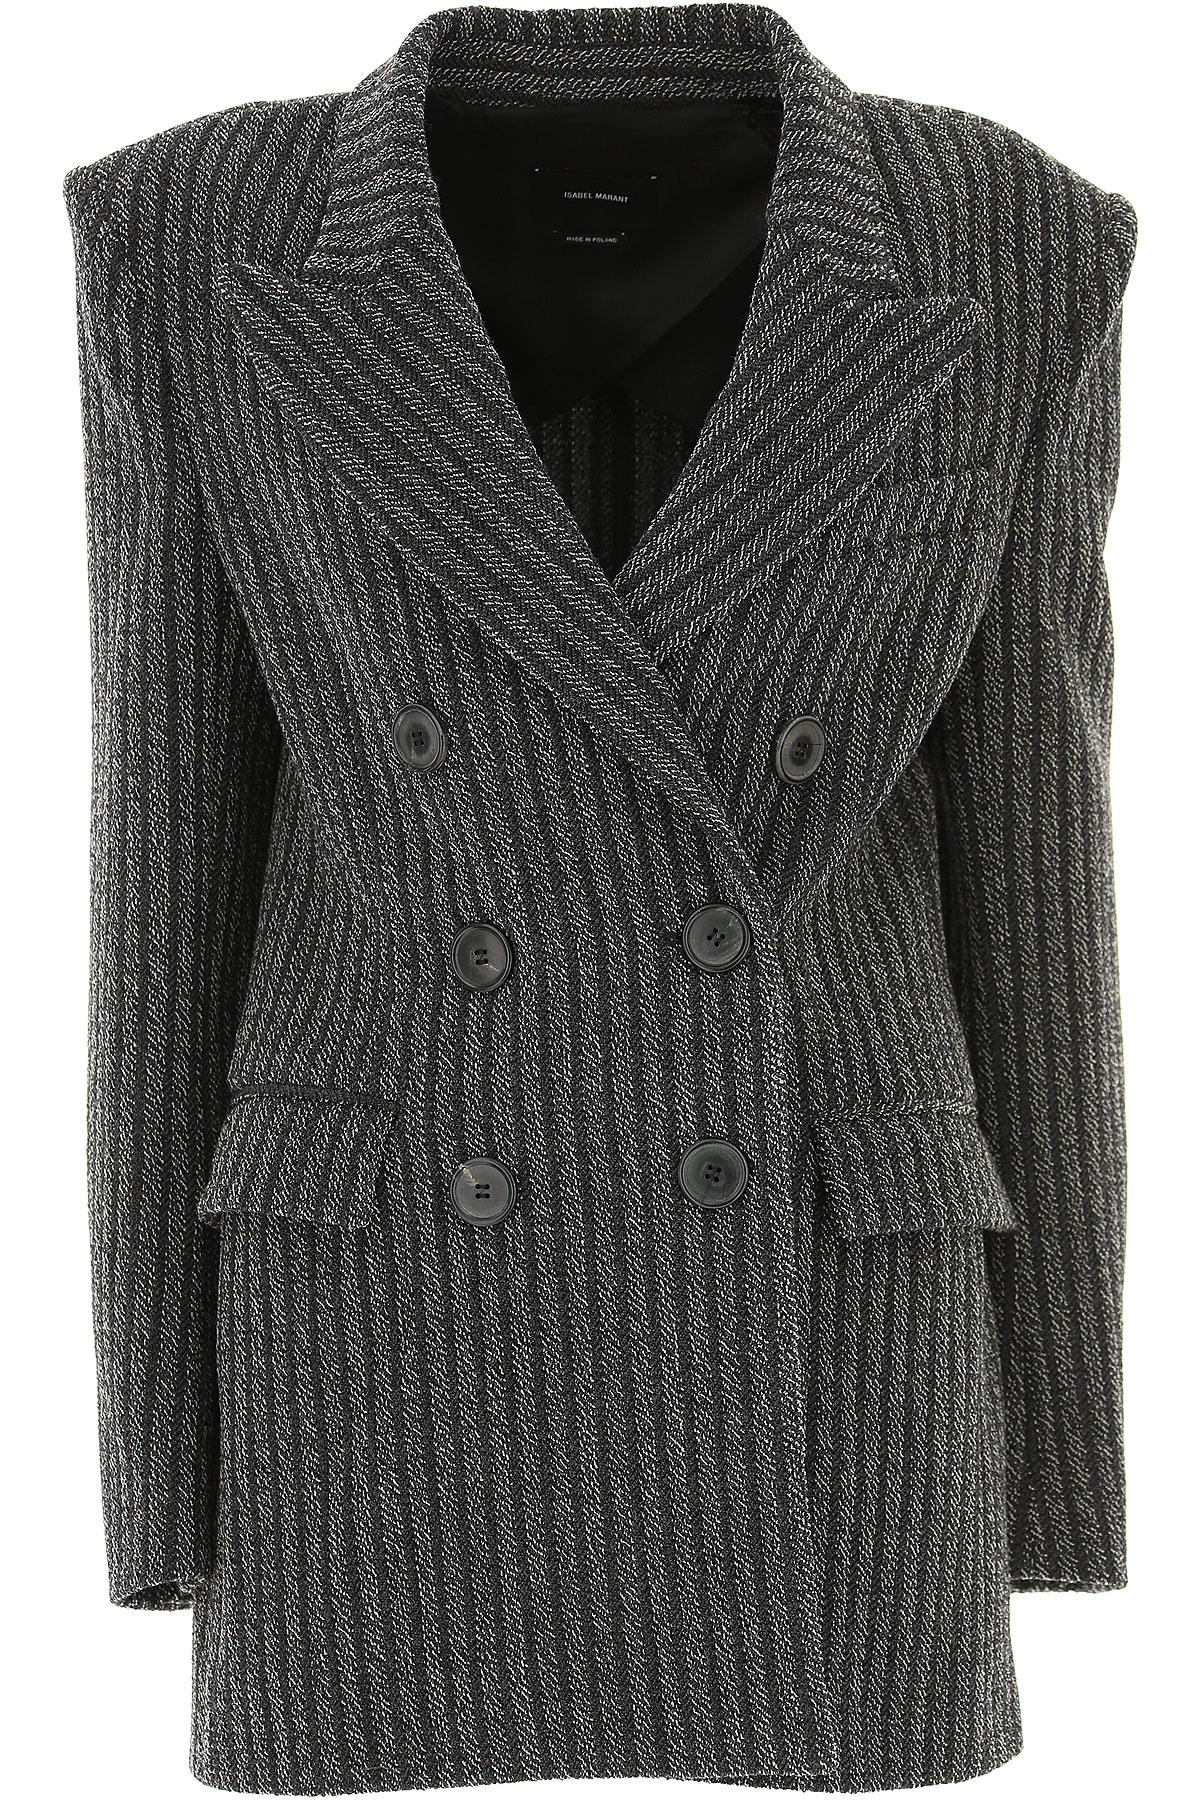 Image of Isabel Marant Blazer for Women, Medium Grey, Virgin wool, 2017, FR 36 • IT 40 FR 38 • IT 42 FR 40 • IT 44